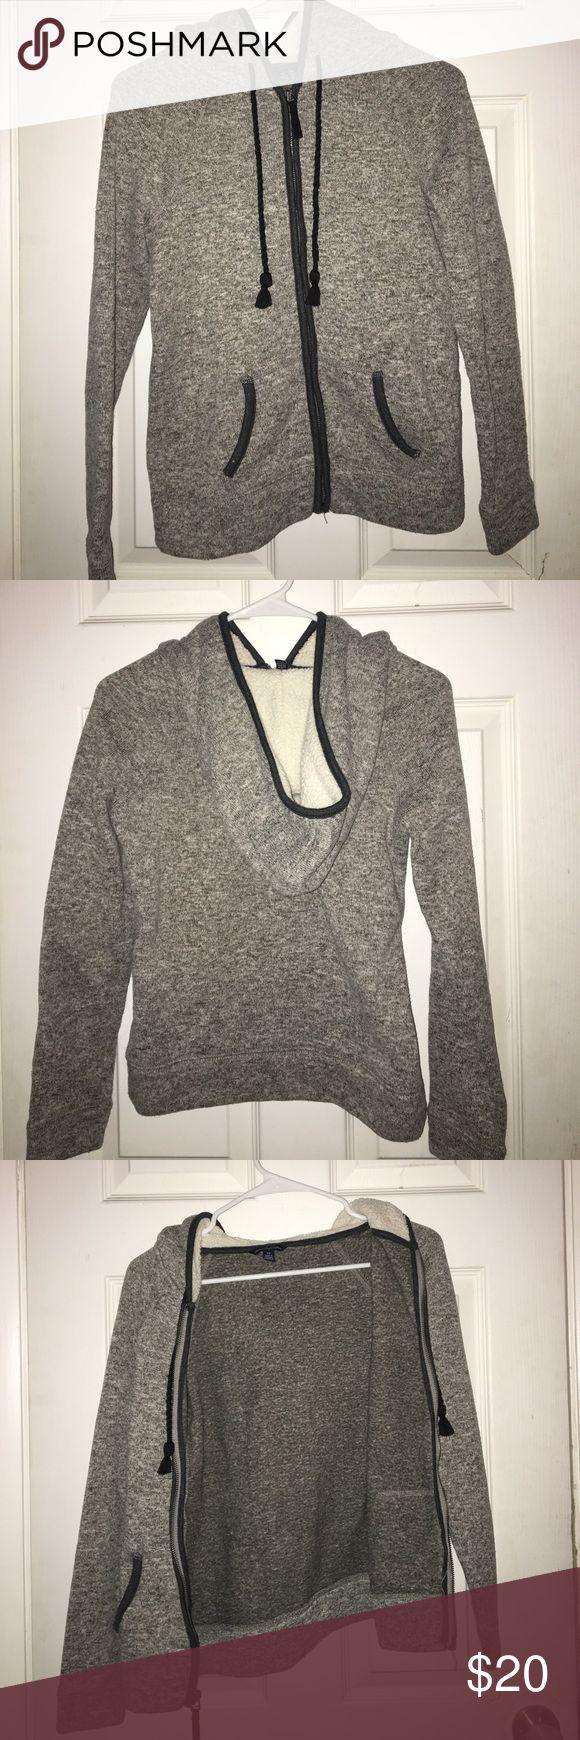 American Eagle Sweatshirt Very warm and cozy American Eagle Sweatshirt! No stains or rips😊 American Eagle Outfitters Tops Sweatshirts & Hoodies